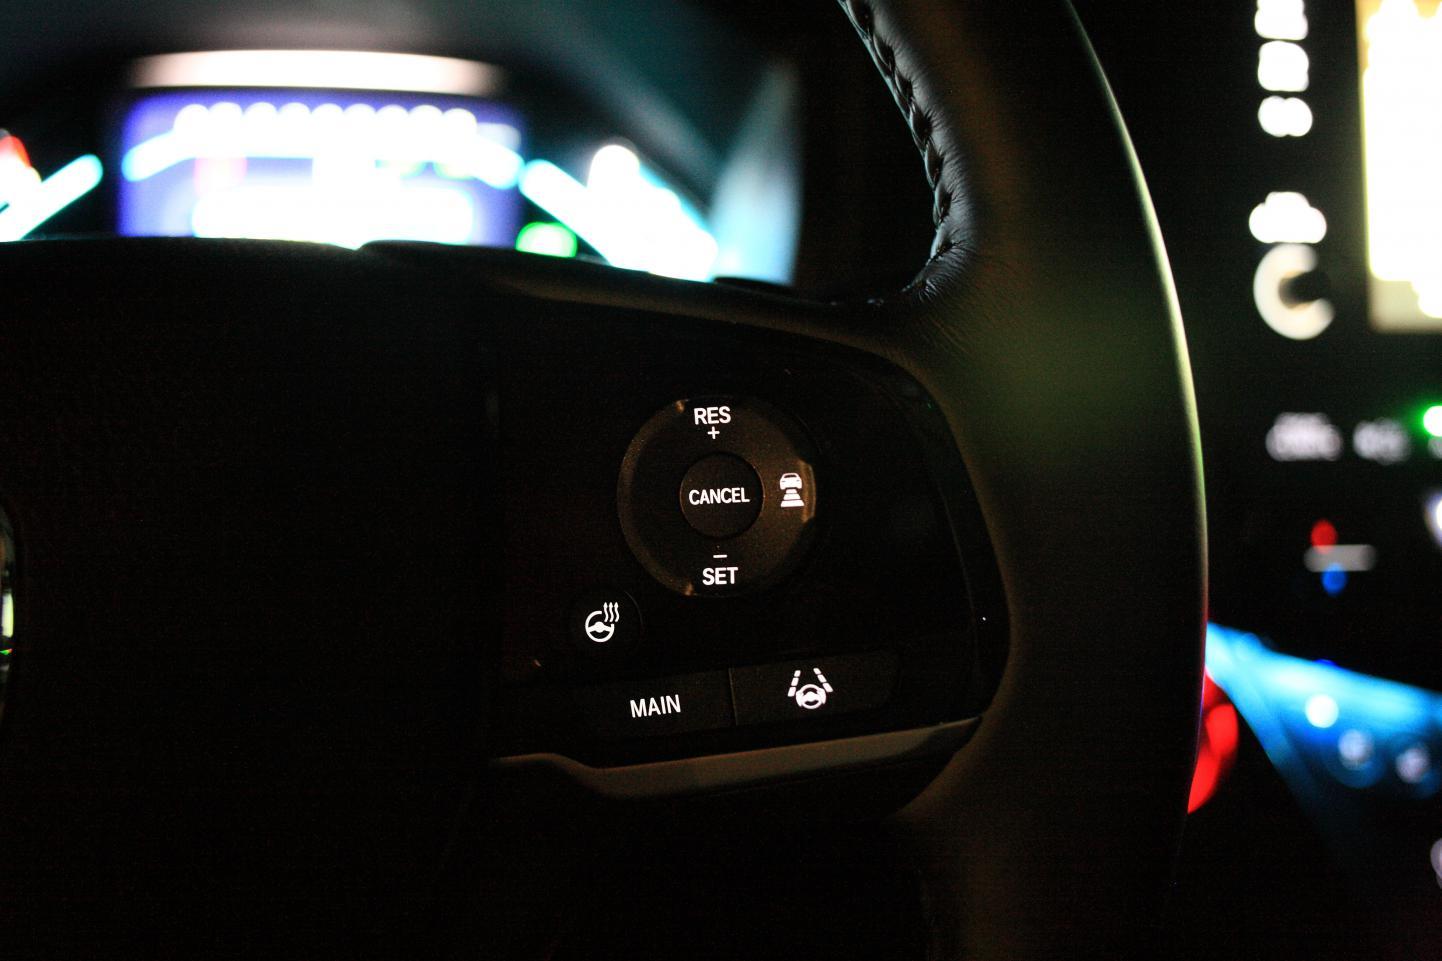 Panel and Button Lighting when Using Headlights-img_2348.jpg